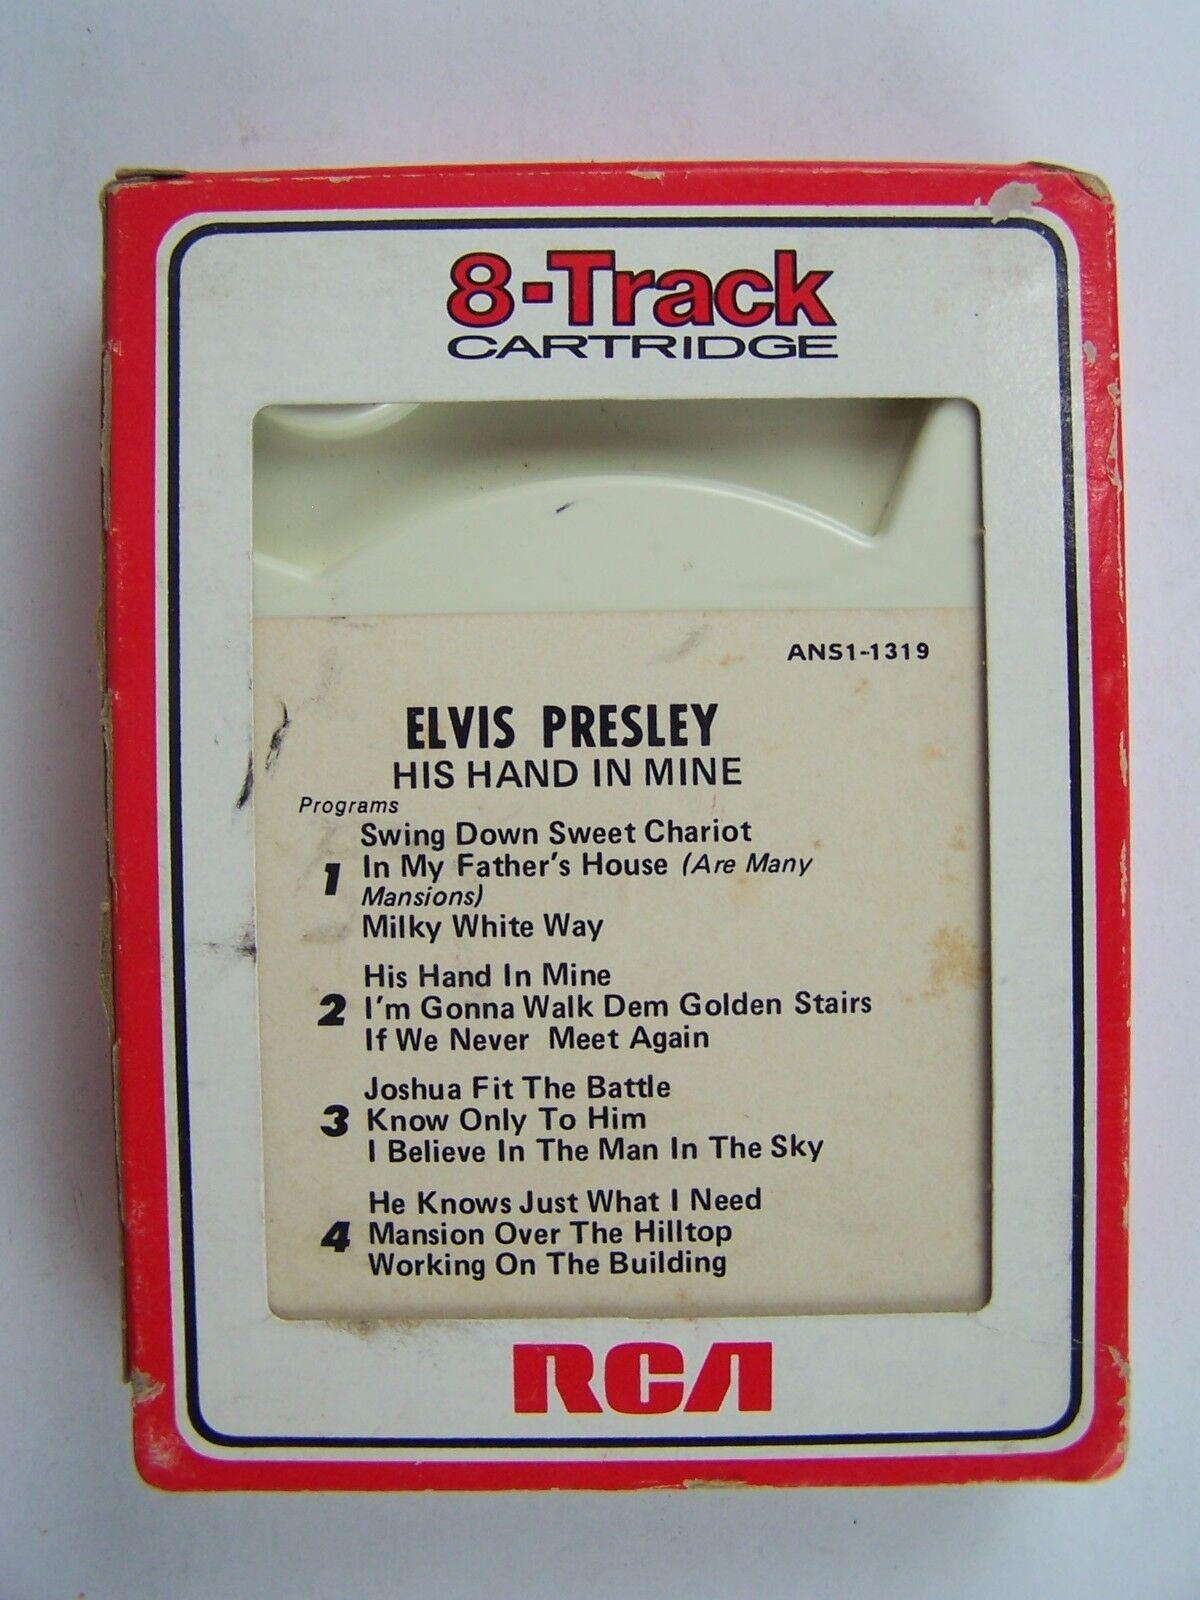 Elvis Presley - His Hand In Mine 8 Track LP Album ANS1-